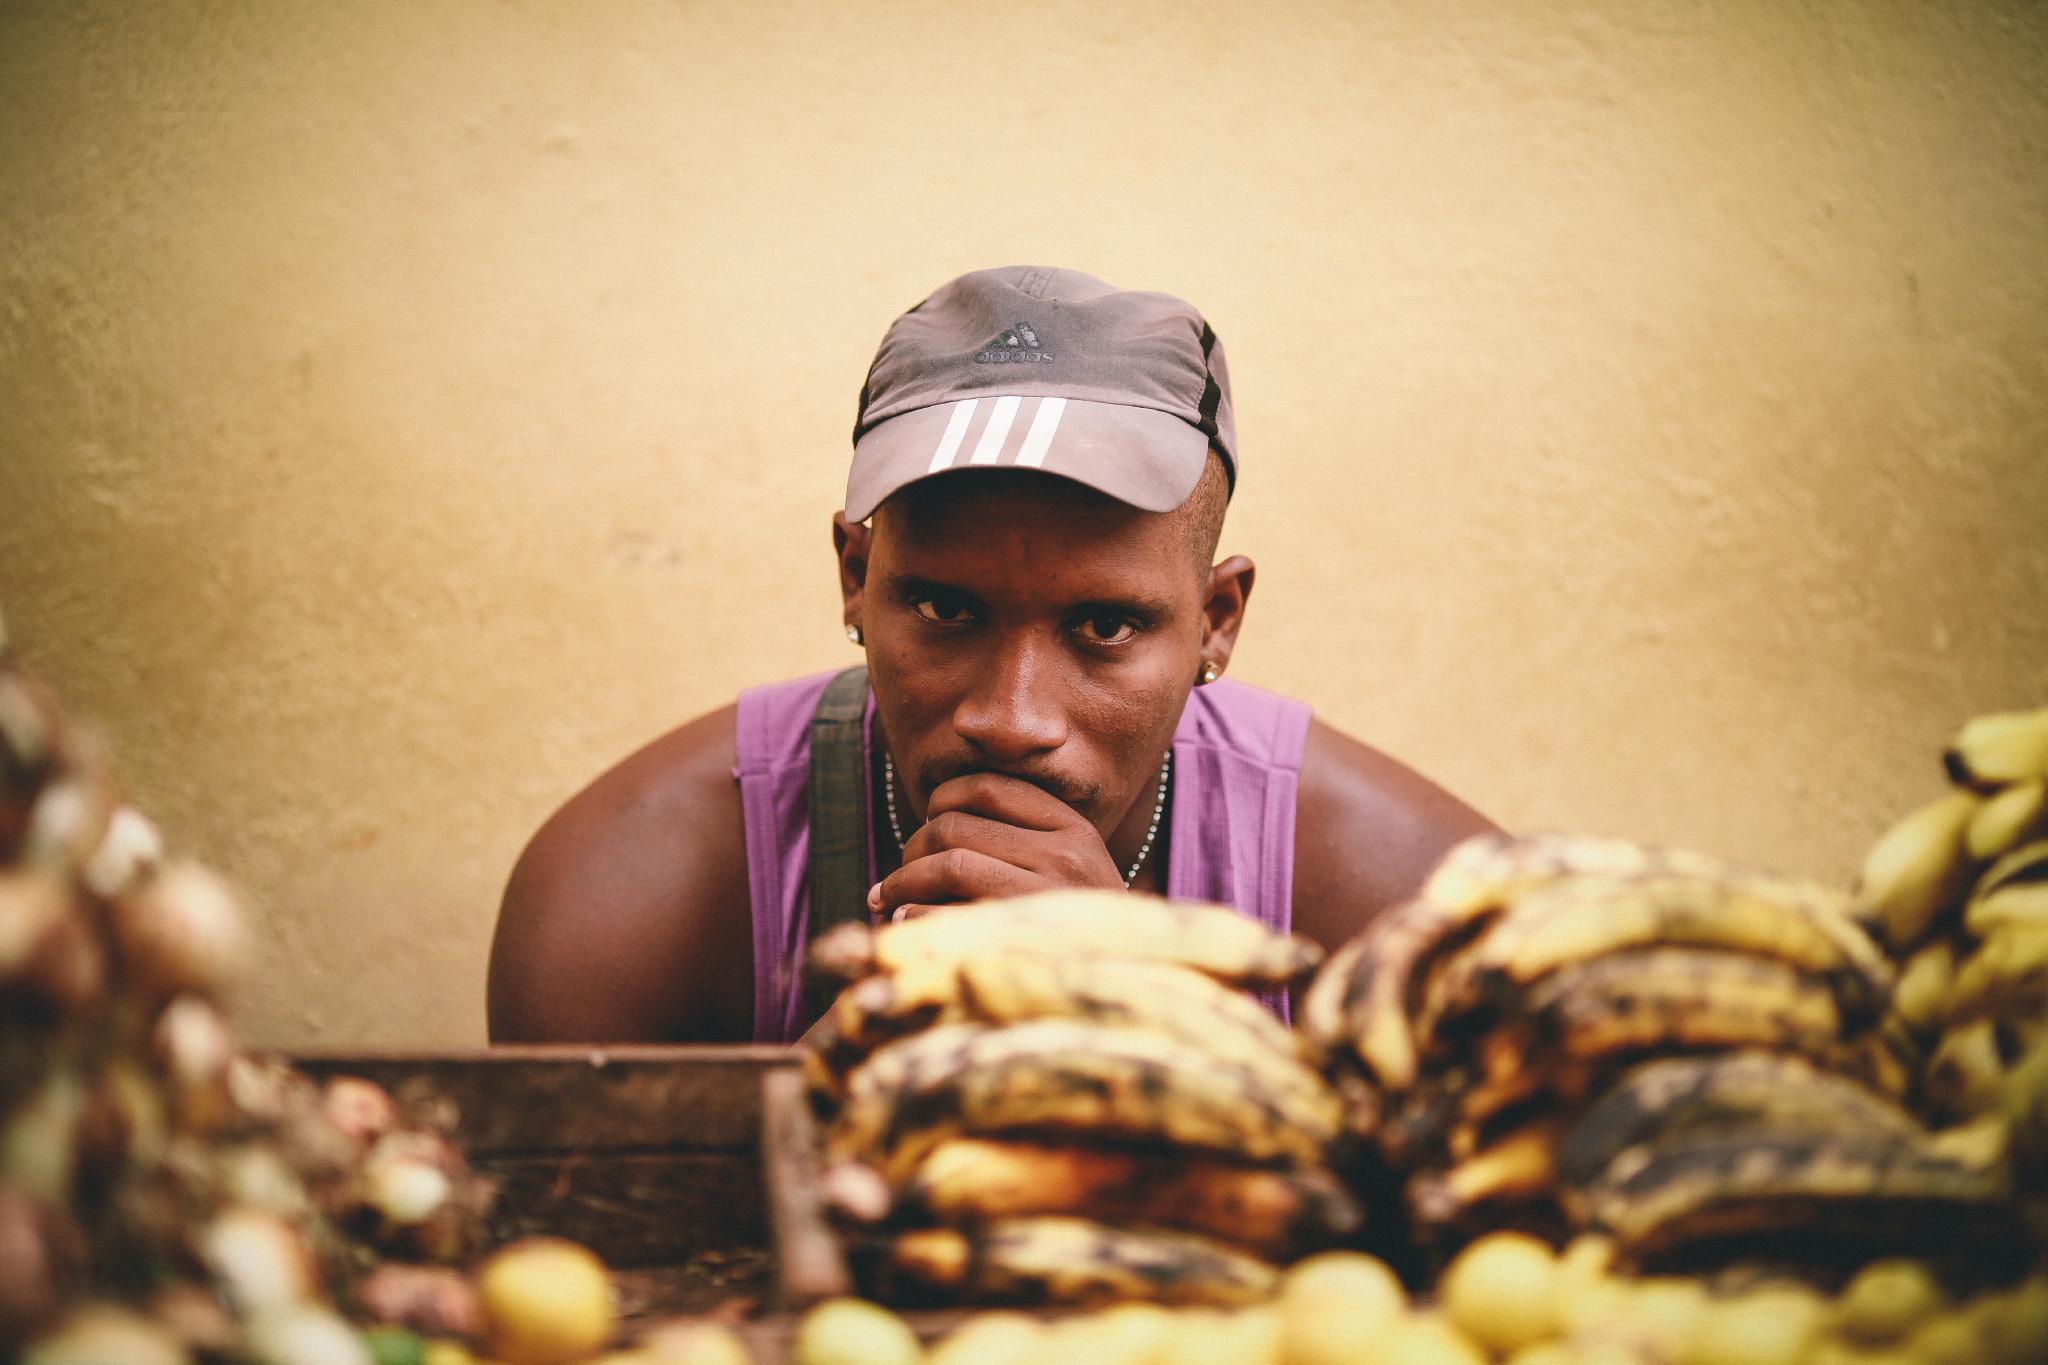 san diego wedding   photographer | man thinking deeply looking at bananas